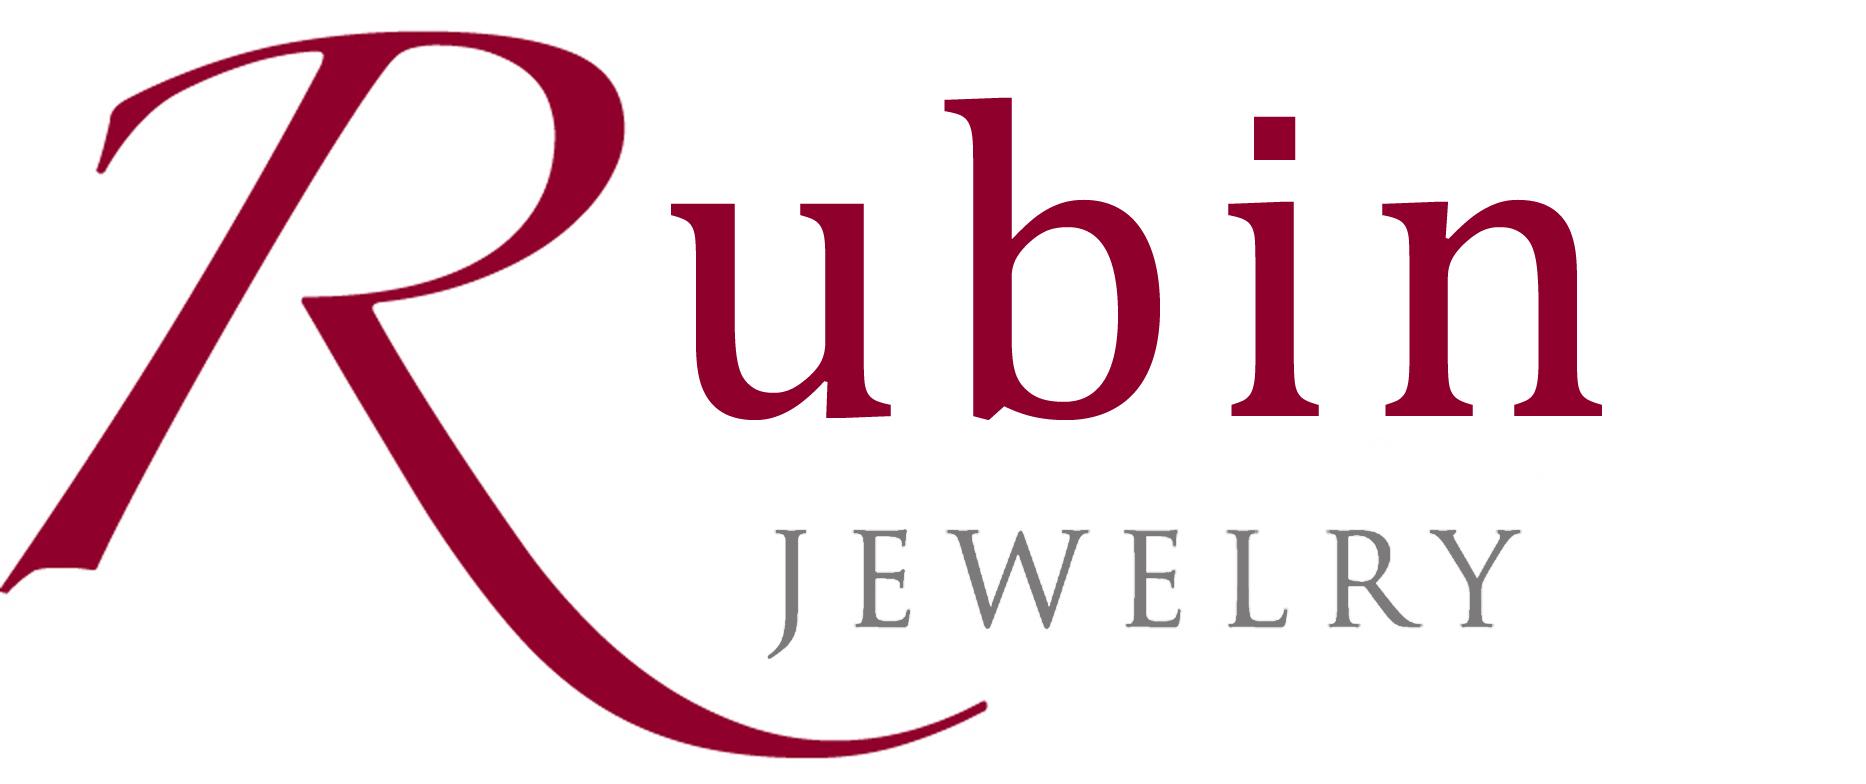 Rubin Logo Wallpaper